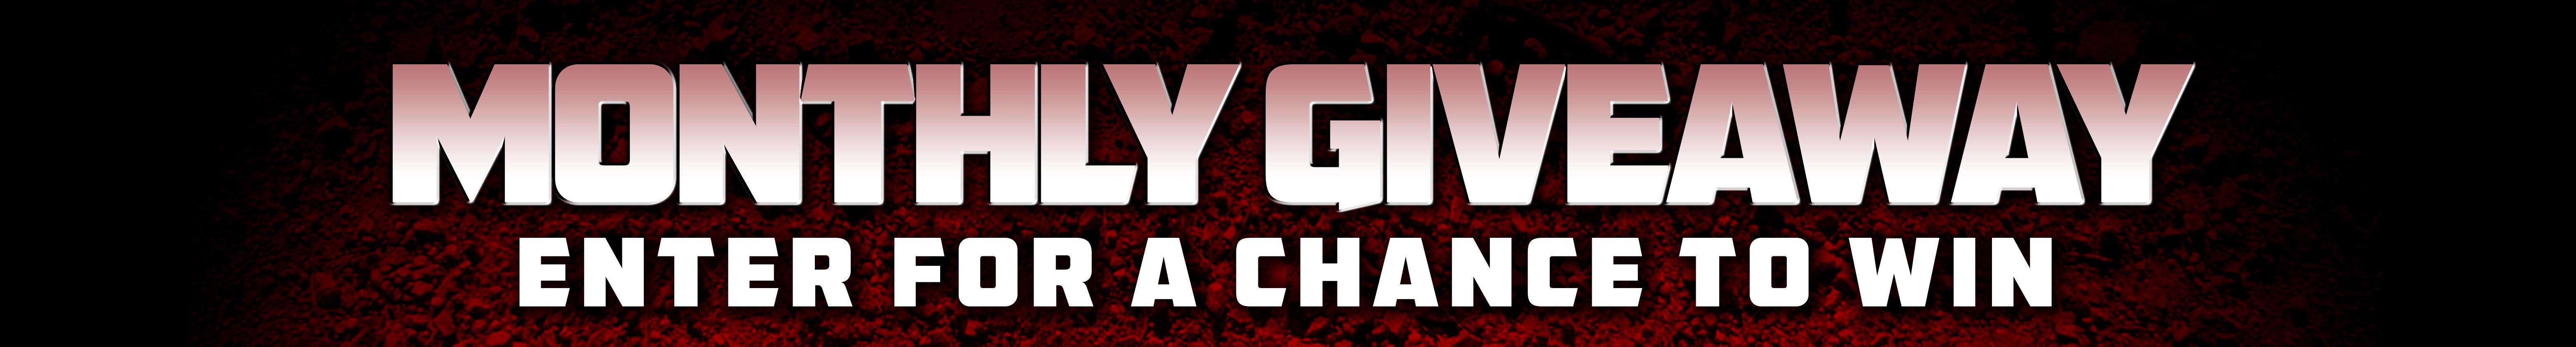 giveawaybanner.jpg